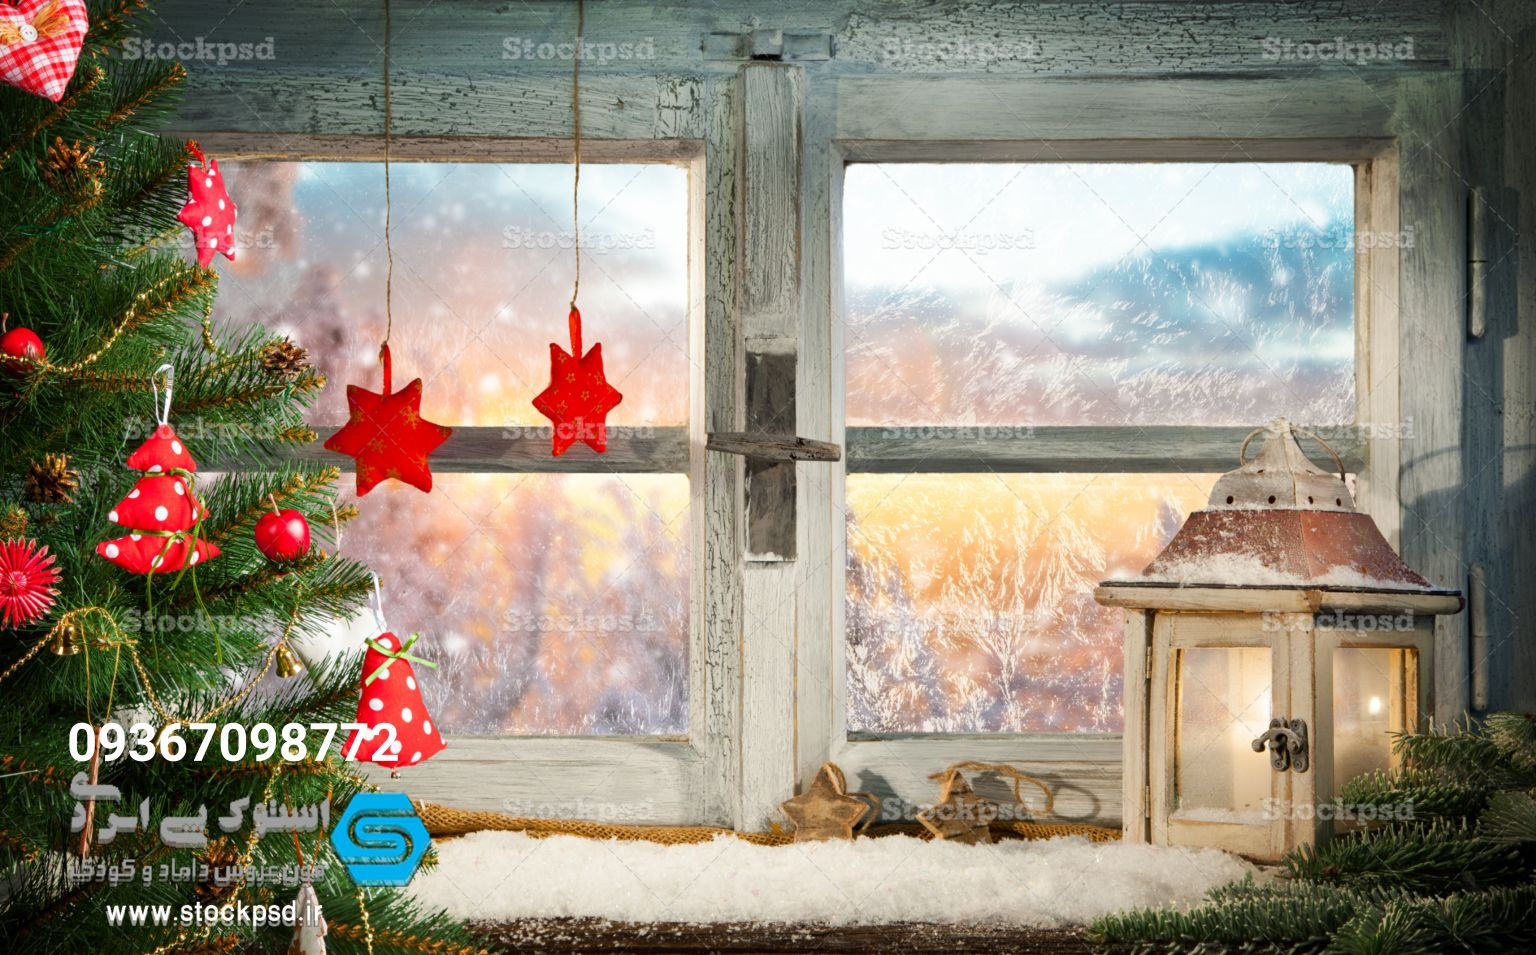 بک گراند جشن کریسمس